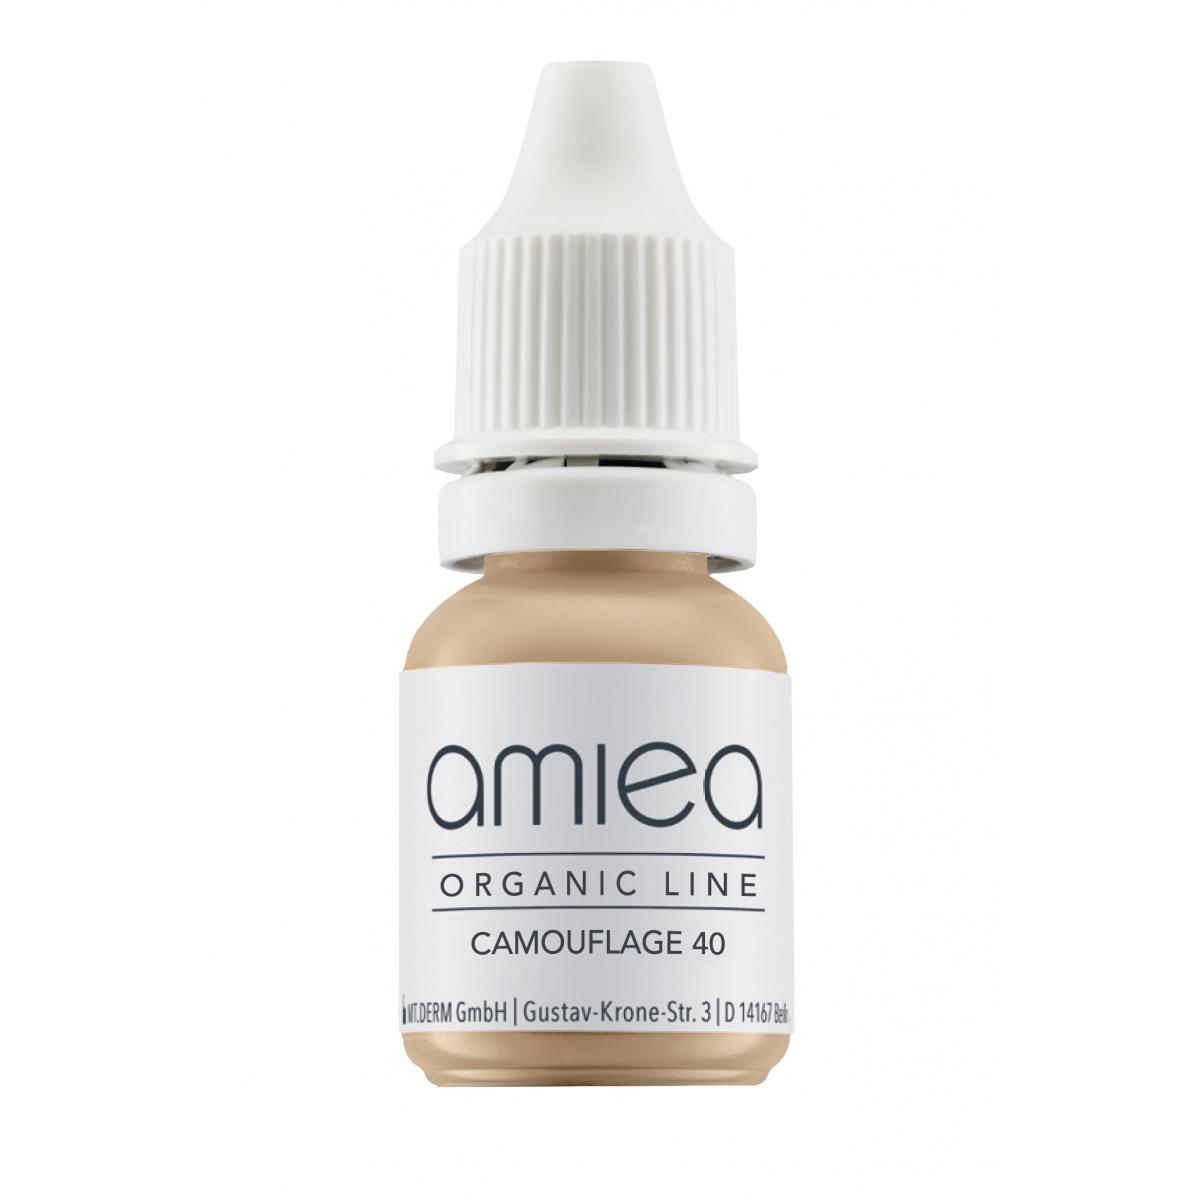 Organicline (10 ml) - PIGMENTS AMIEA ORGANICLINE CAMOUFLAGE 40, Flacon 10 ml